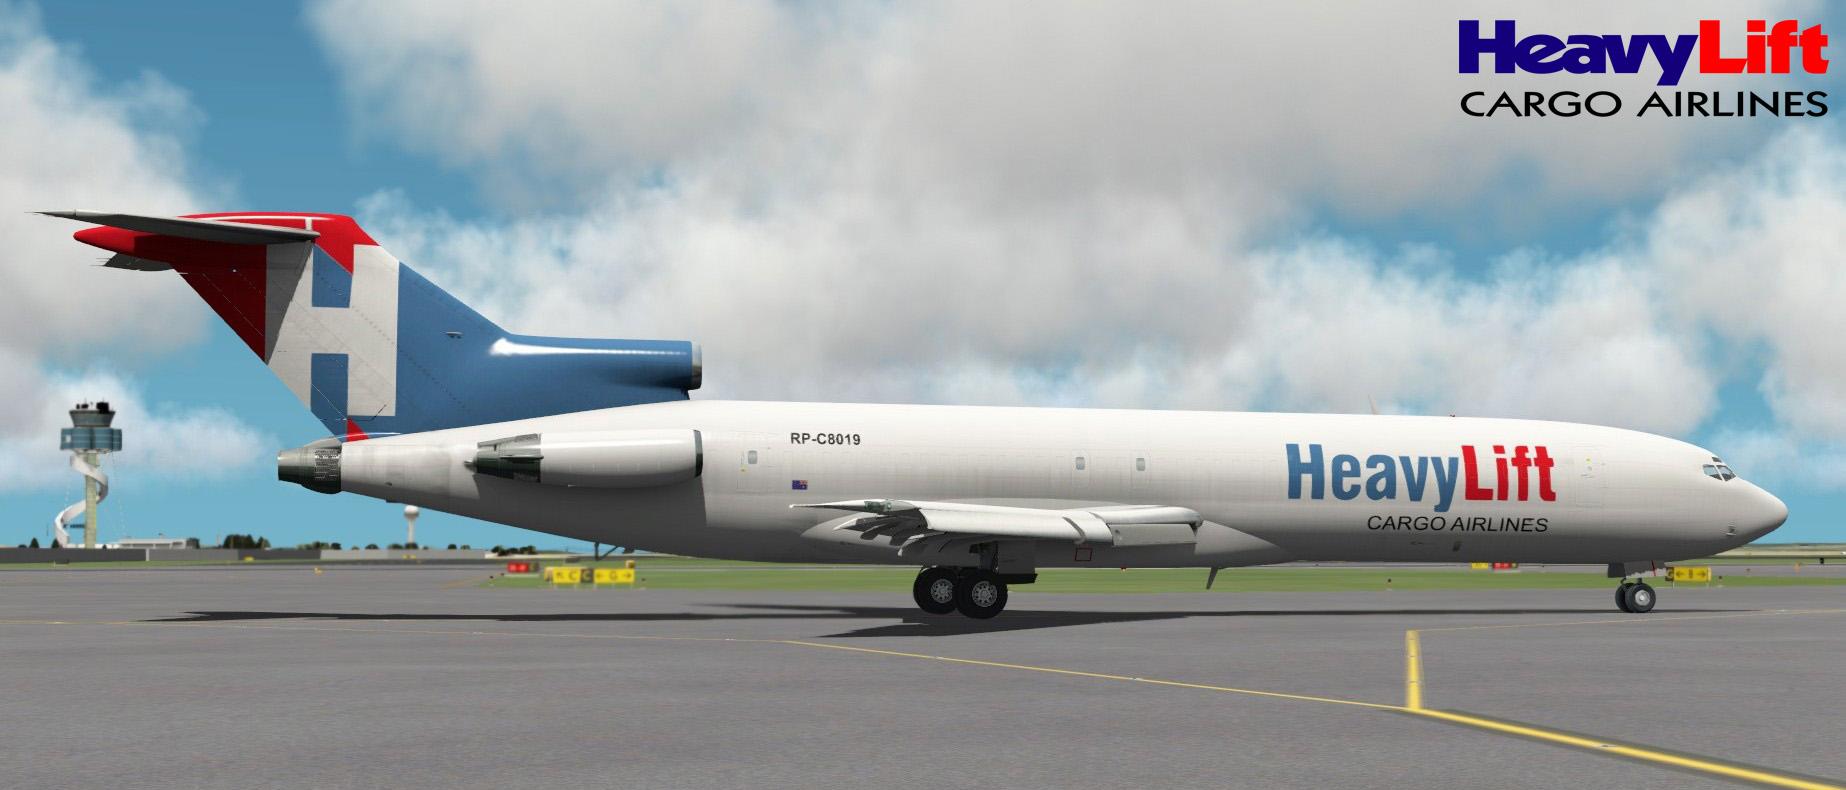 HeavyLift Cargo Airlines Boeing 727-227F 'RP-C8019' FlyJSim